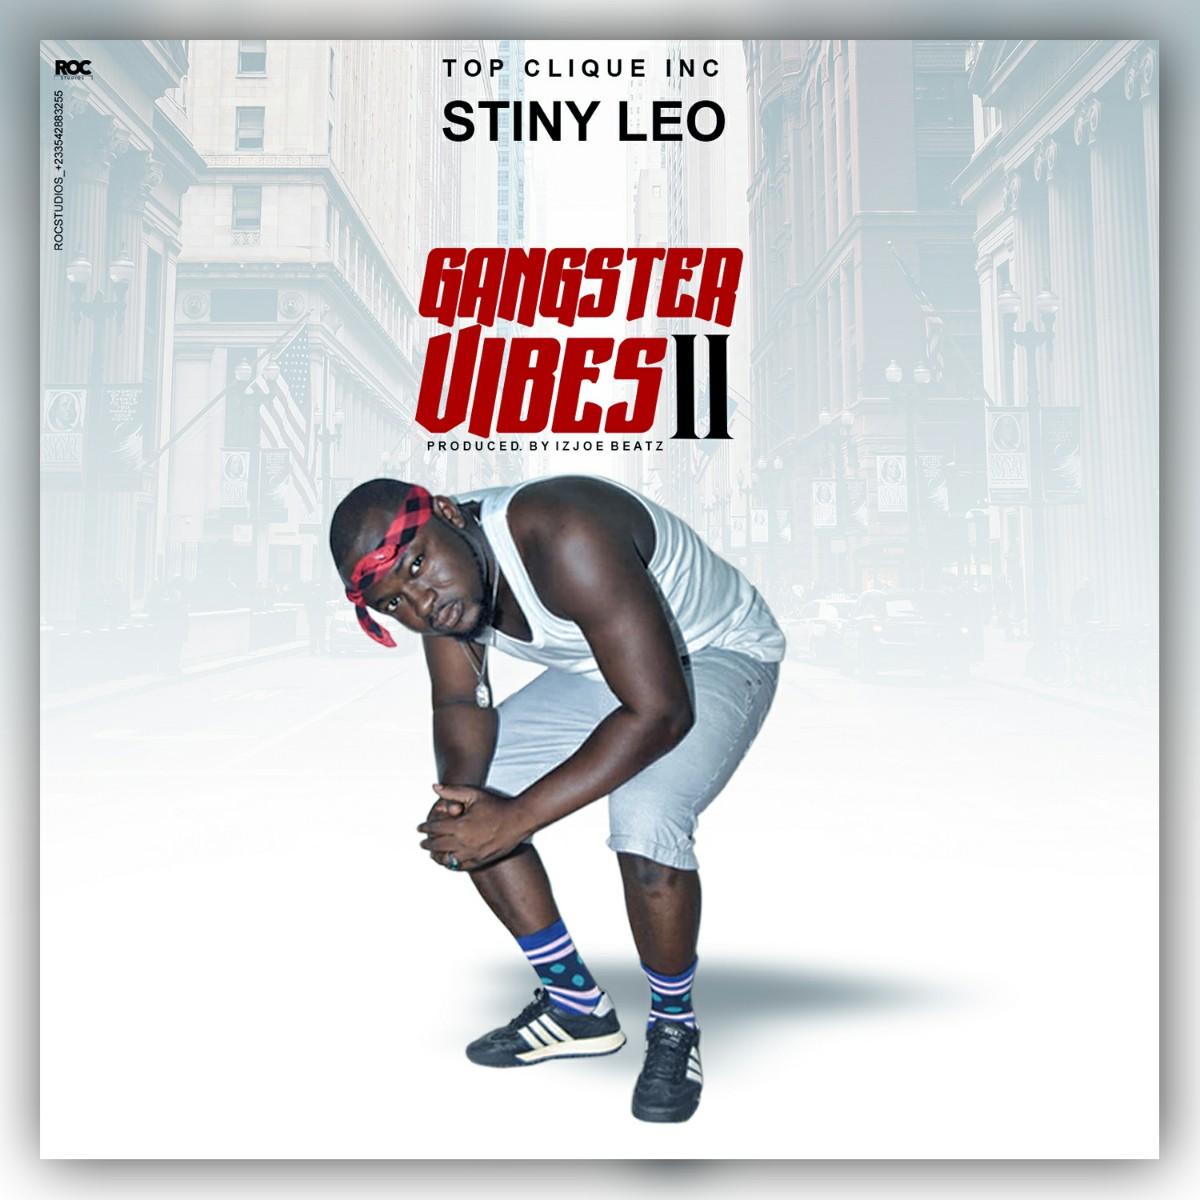 Stiny Leo - Gangster Vibes II